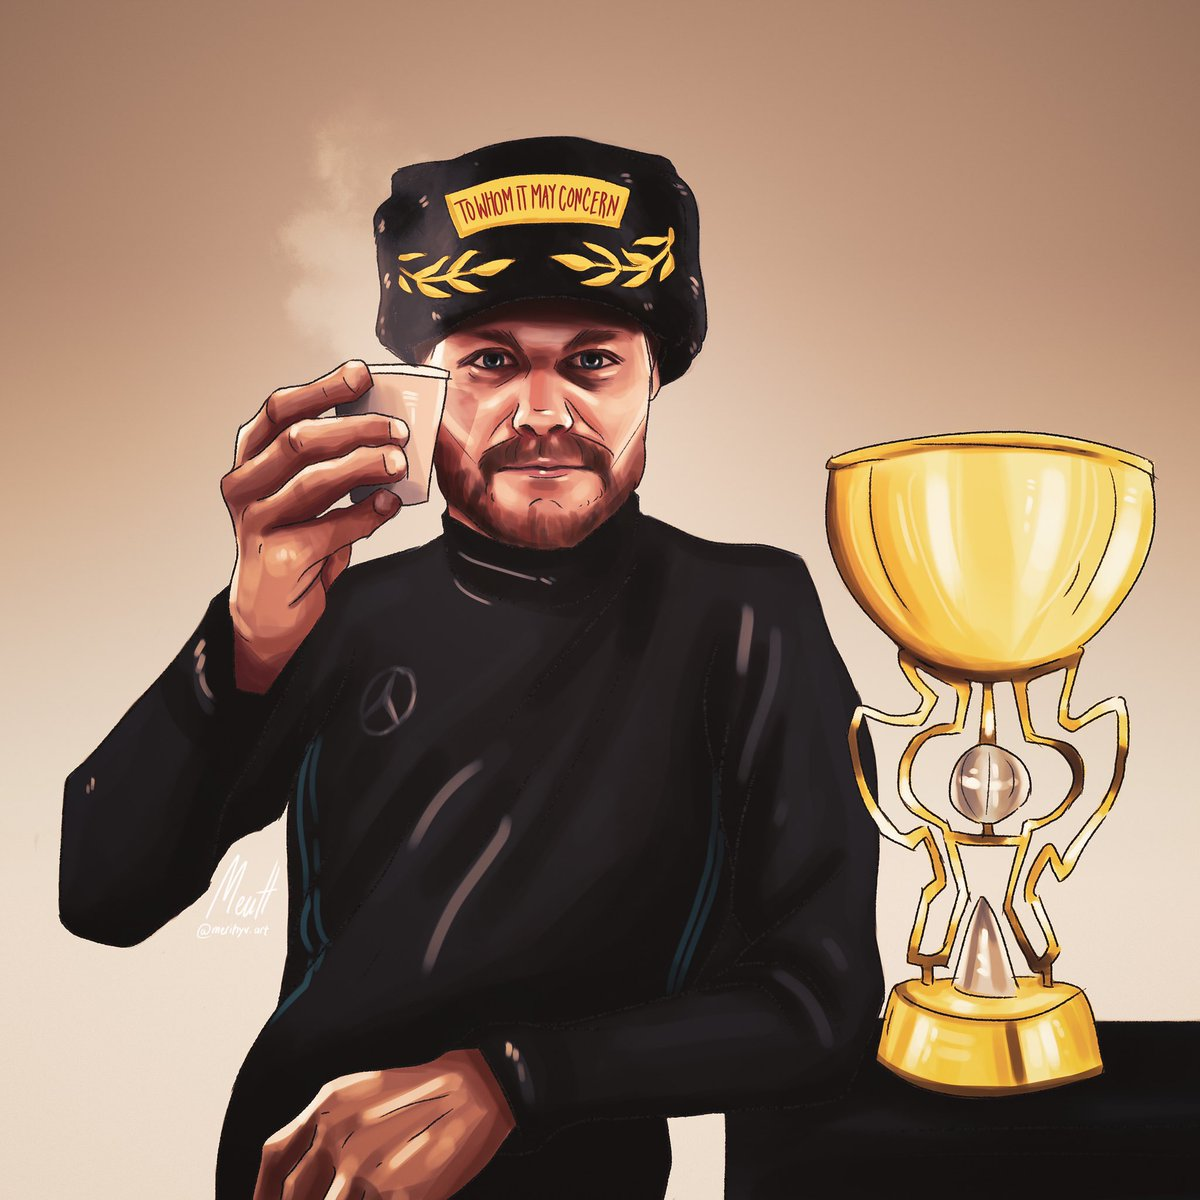 The Coffee Boss. 🧔🏼☕️🏆  🎨 x @merihyvart https://t.co/fcyk6tp04q